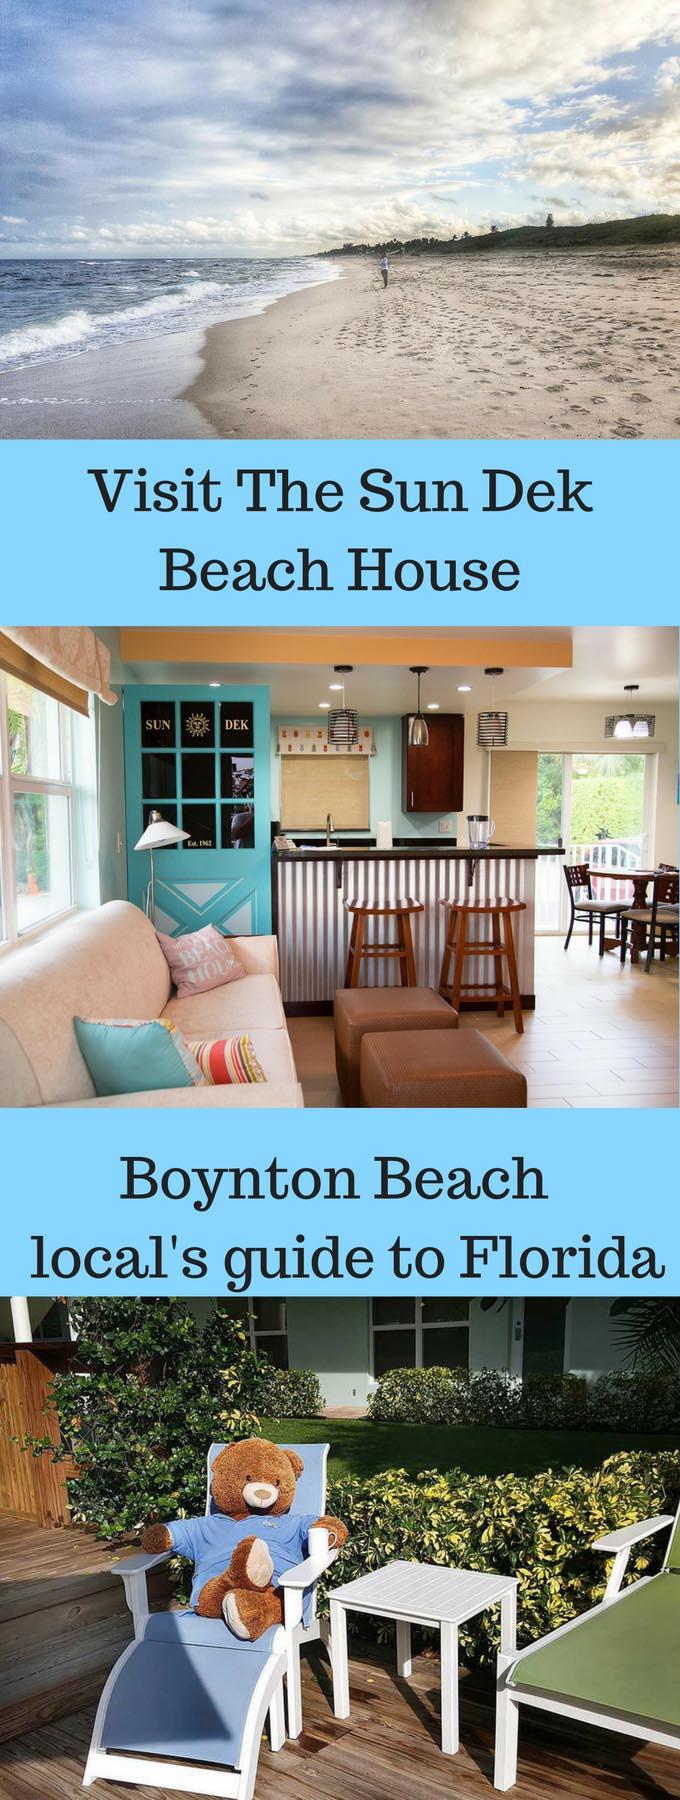 Visit the Sun Dek Beach House in Boynton Beach, Florida!  Fun in the sun couldn't be better in this tropical paradise!